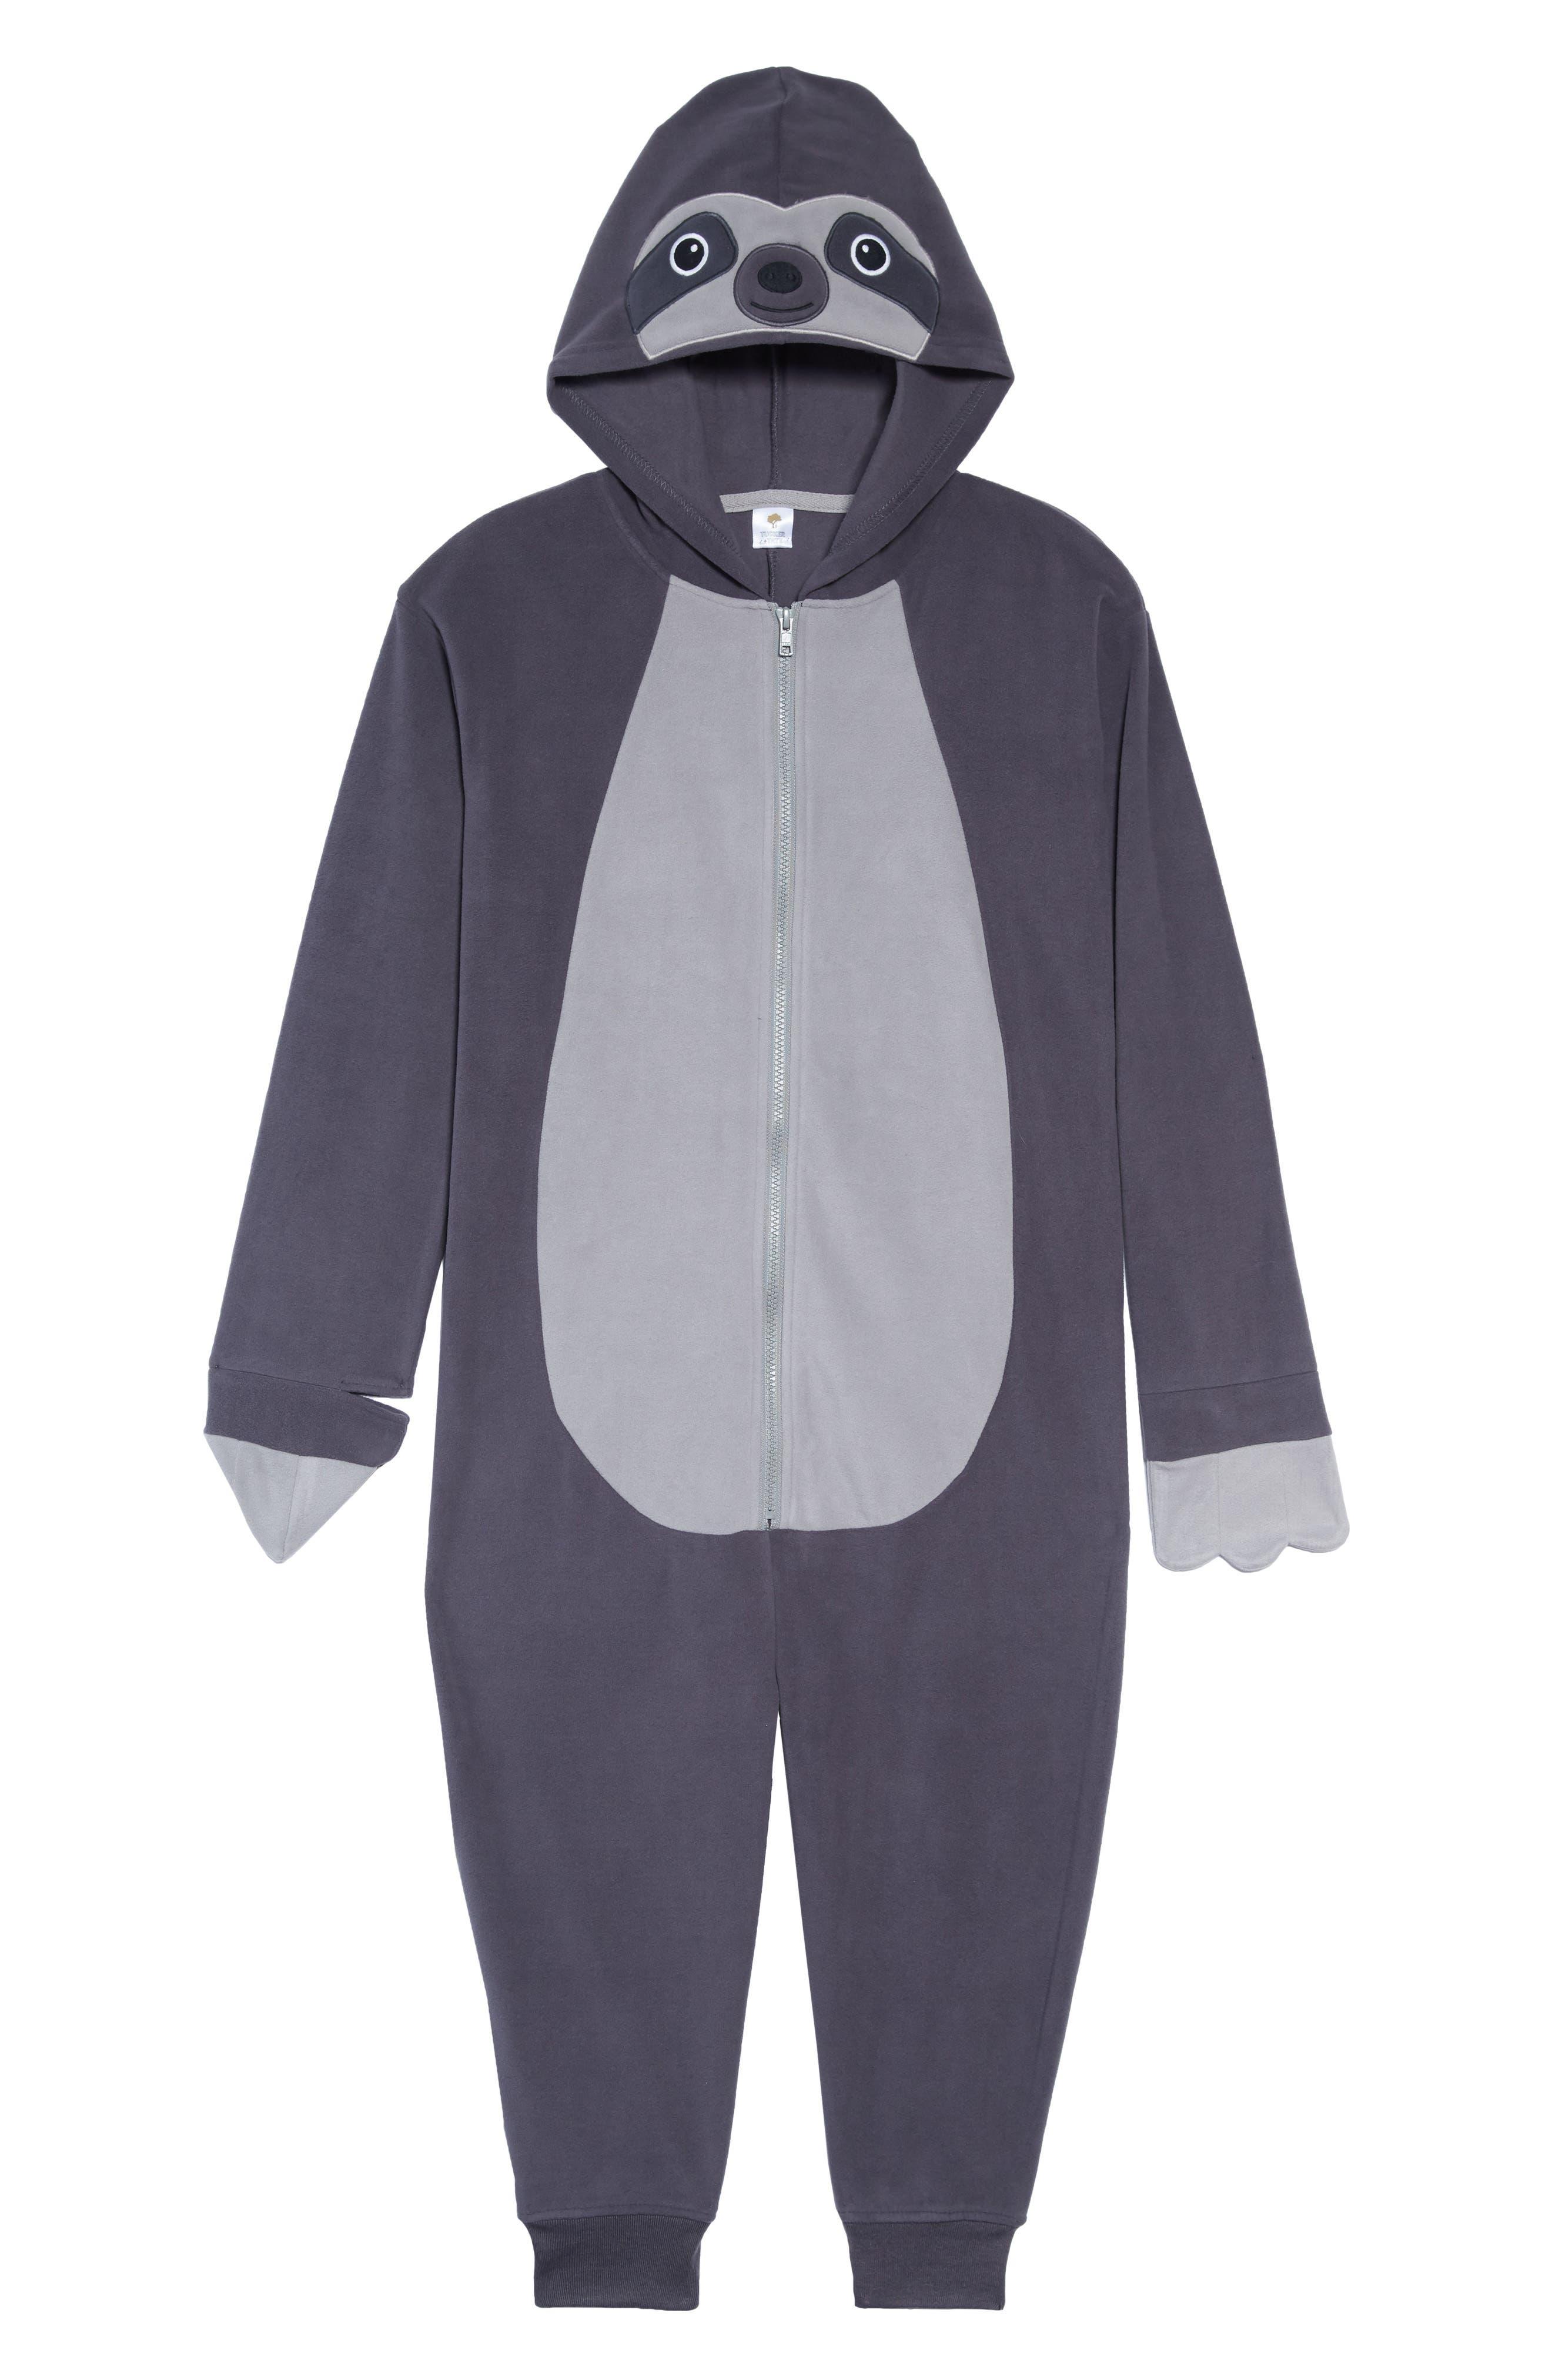 TUCKER + TATE,                             Sloth Hooded One-Piece Pajamas,                             Main thumbnail 1, color,                             021